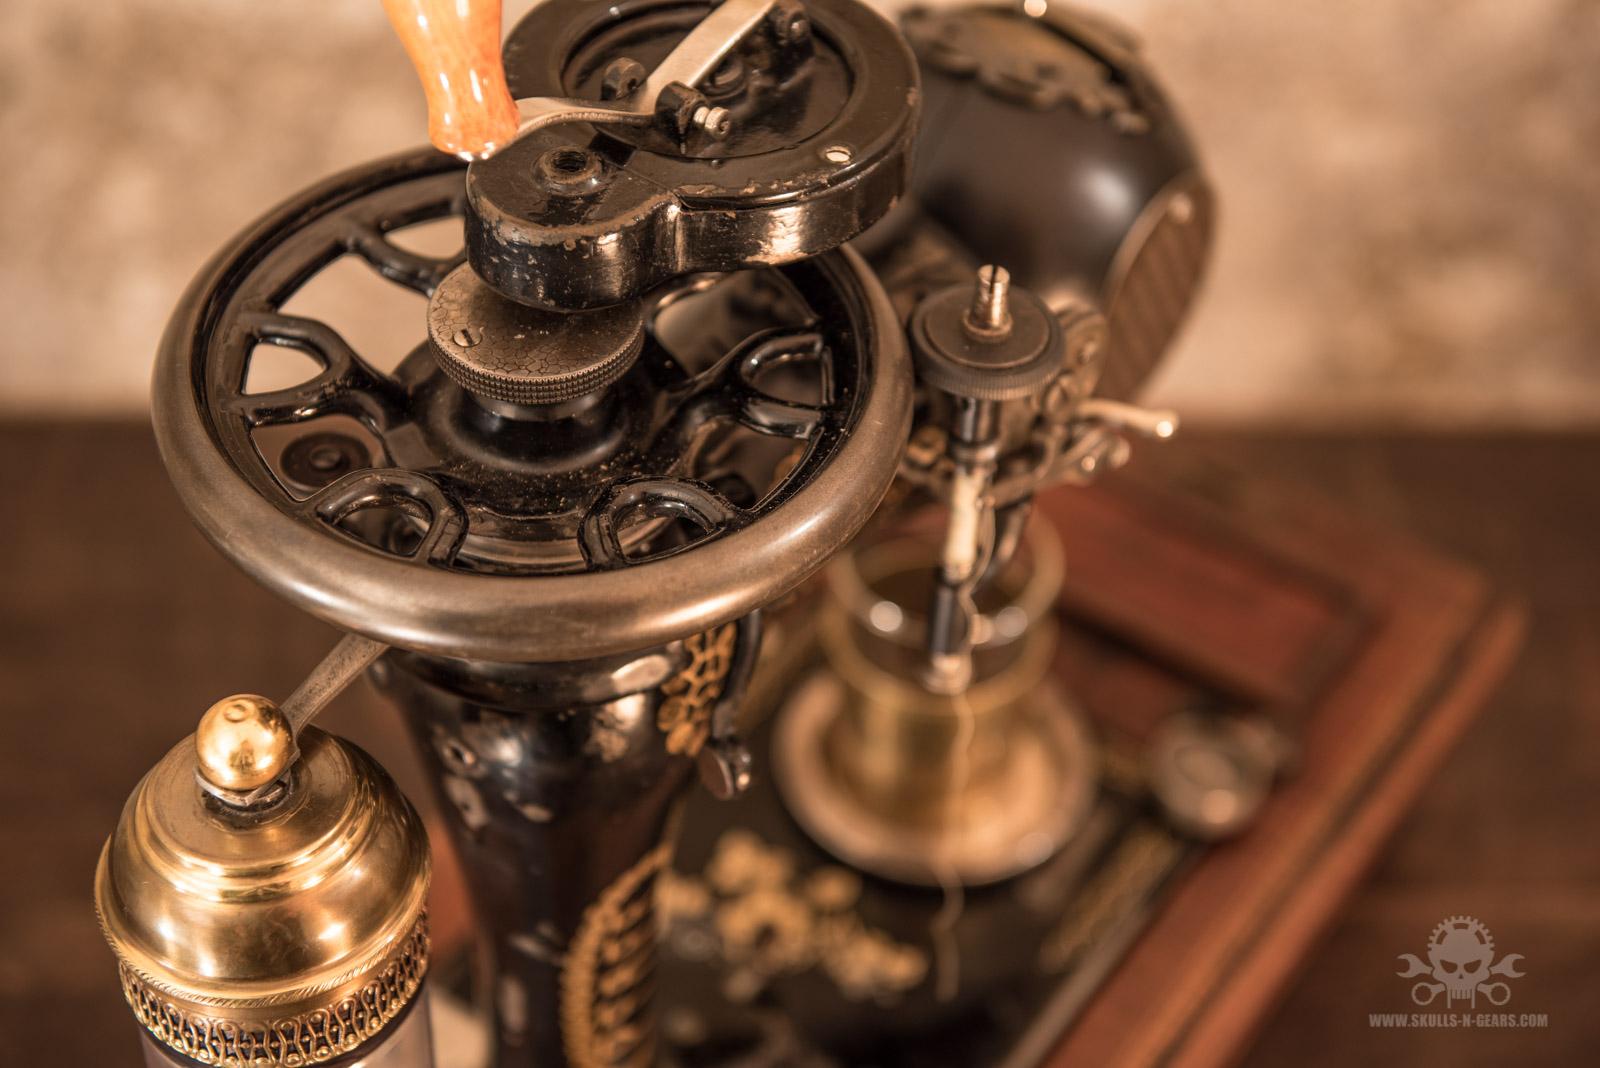 Steampunk_Coffee_Machine-1